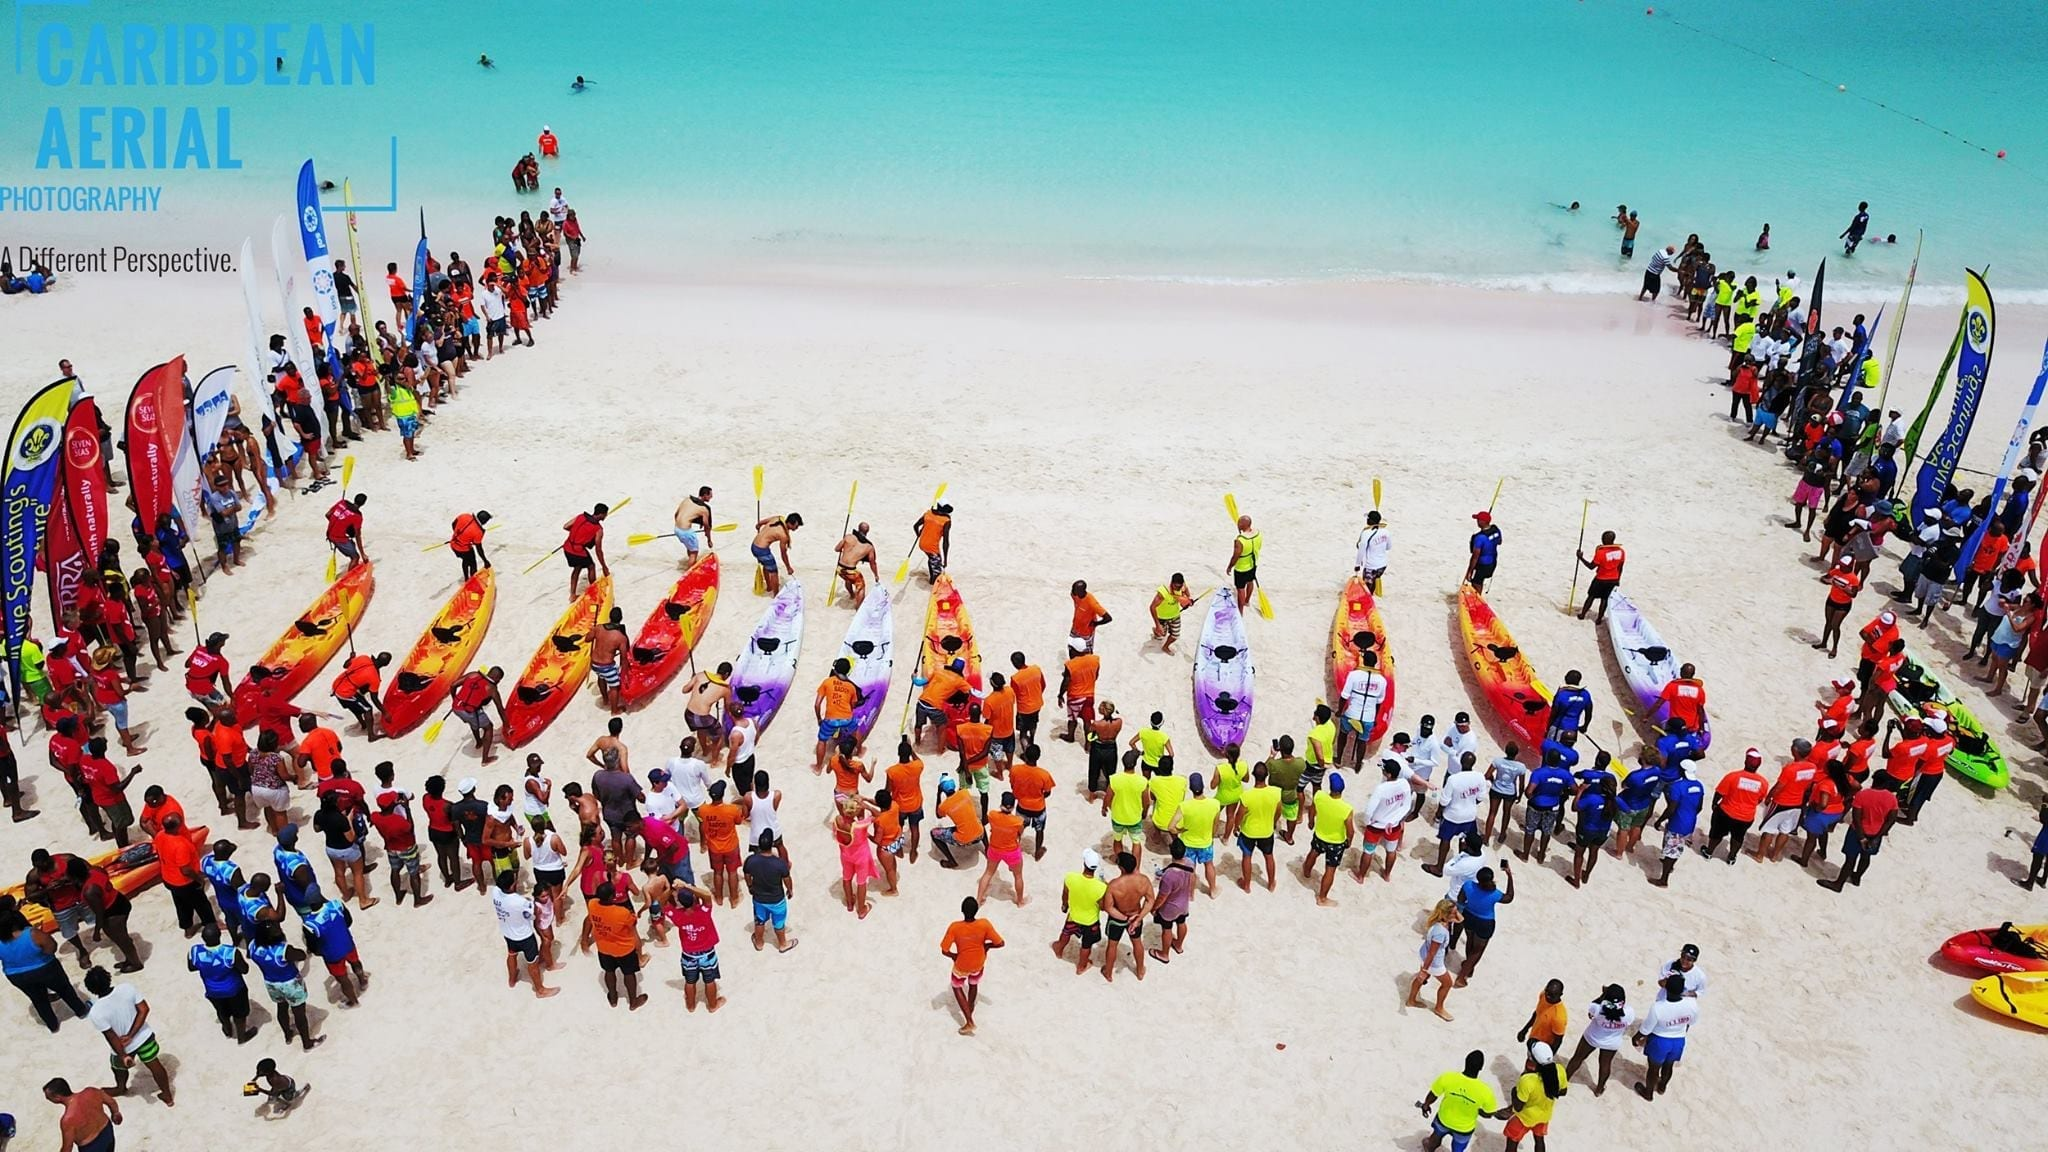 caribbean-aerial-photography-006